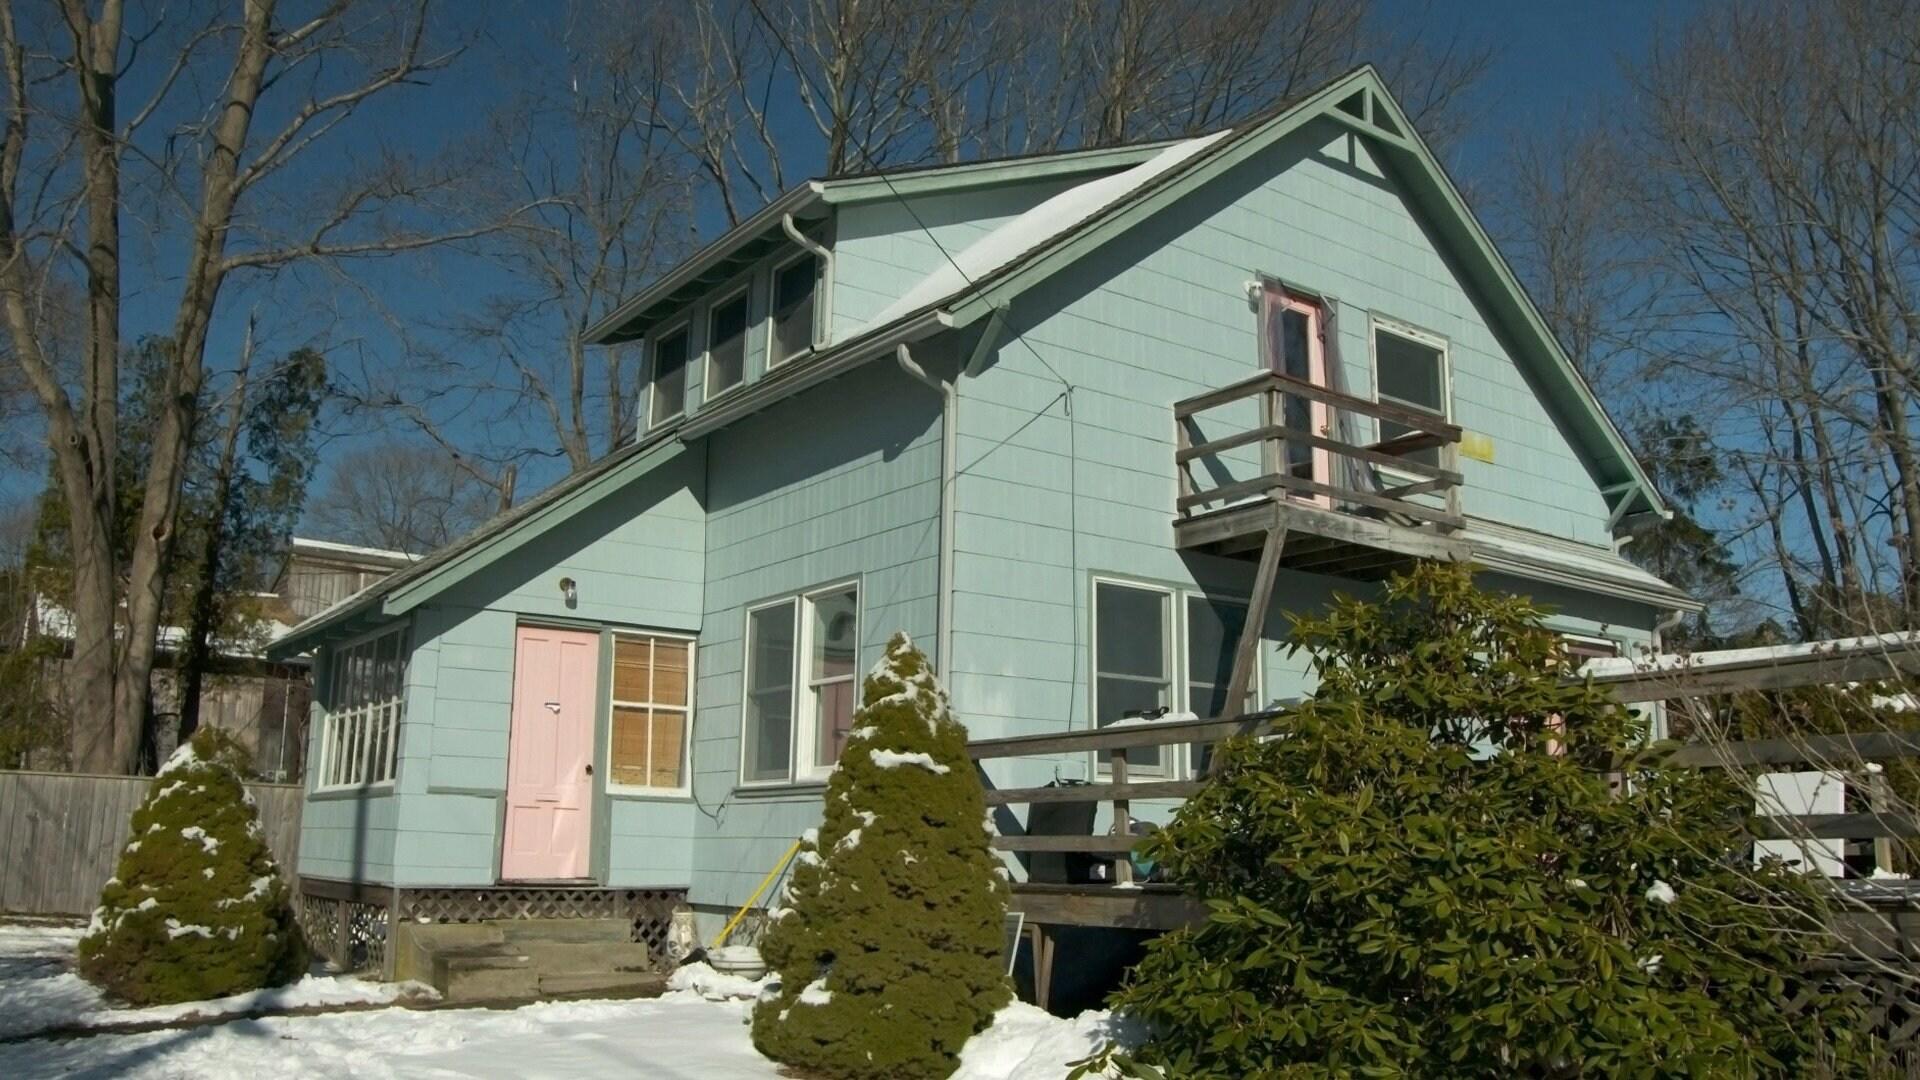 The Jamestown Net-Zero House: The Net-Zero Bungalow